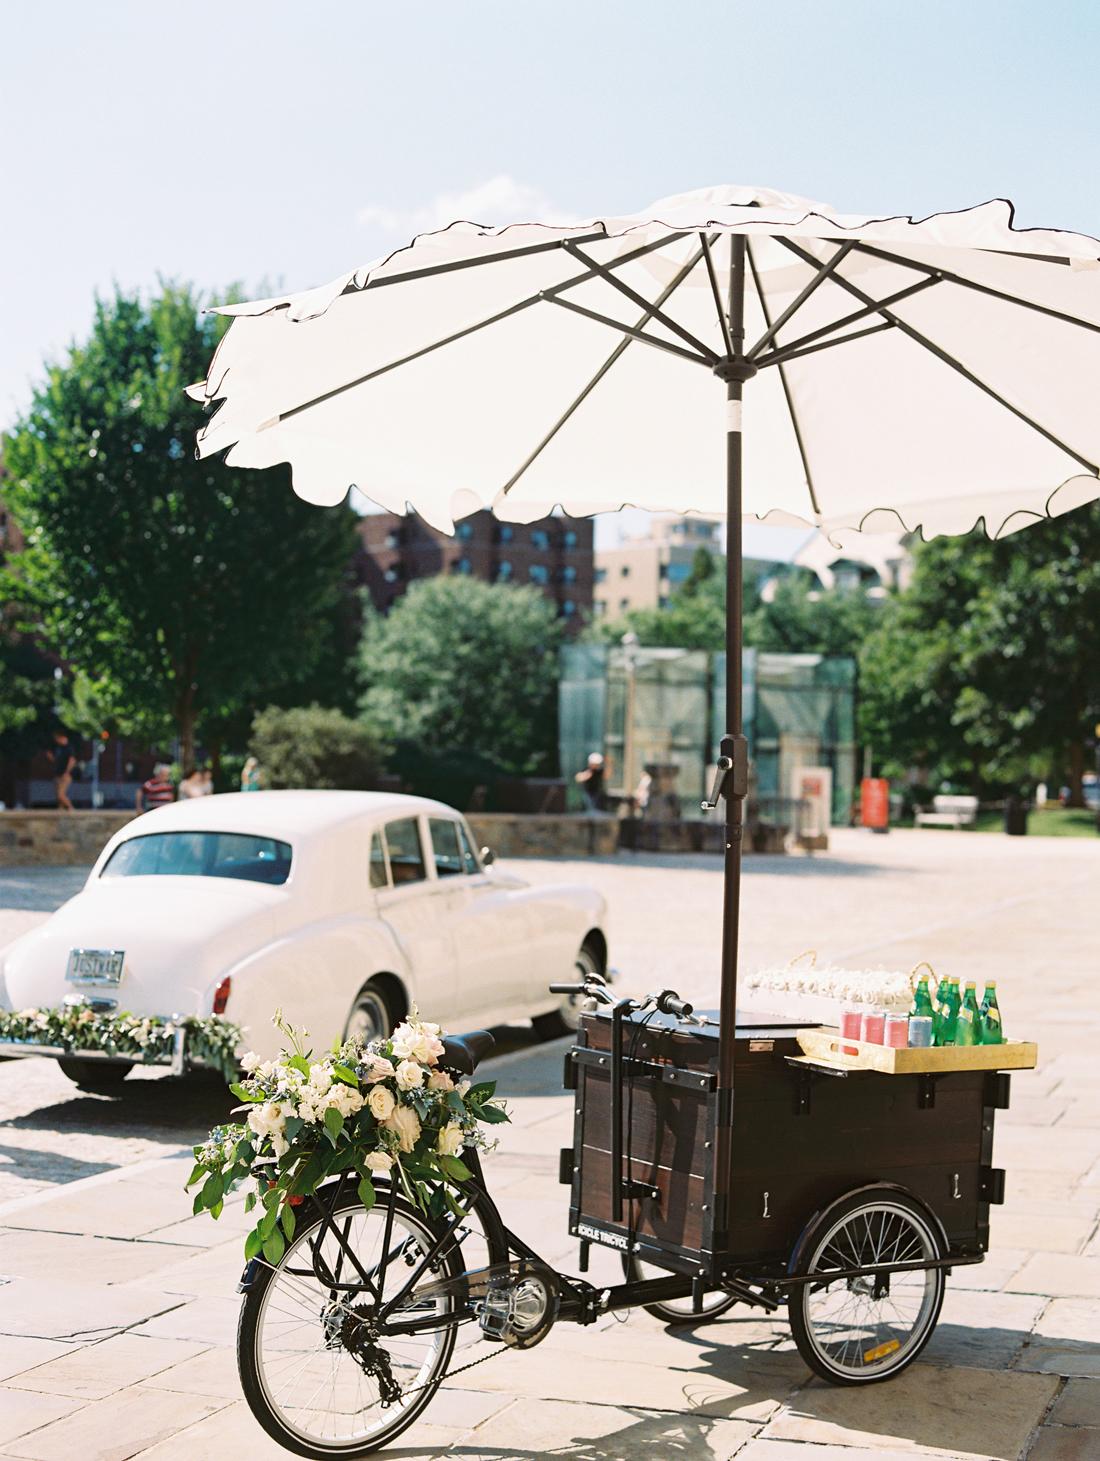 rose bicycle cart with white umbrella next to white vintage car